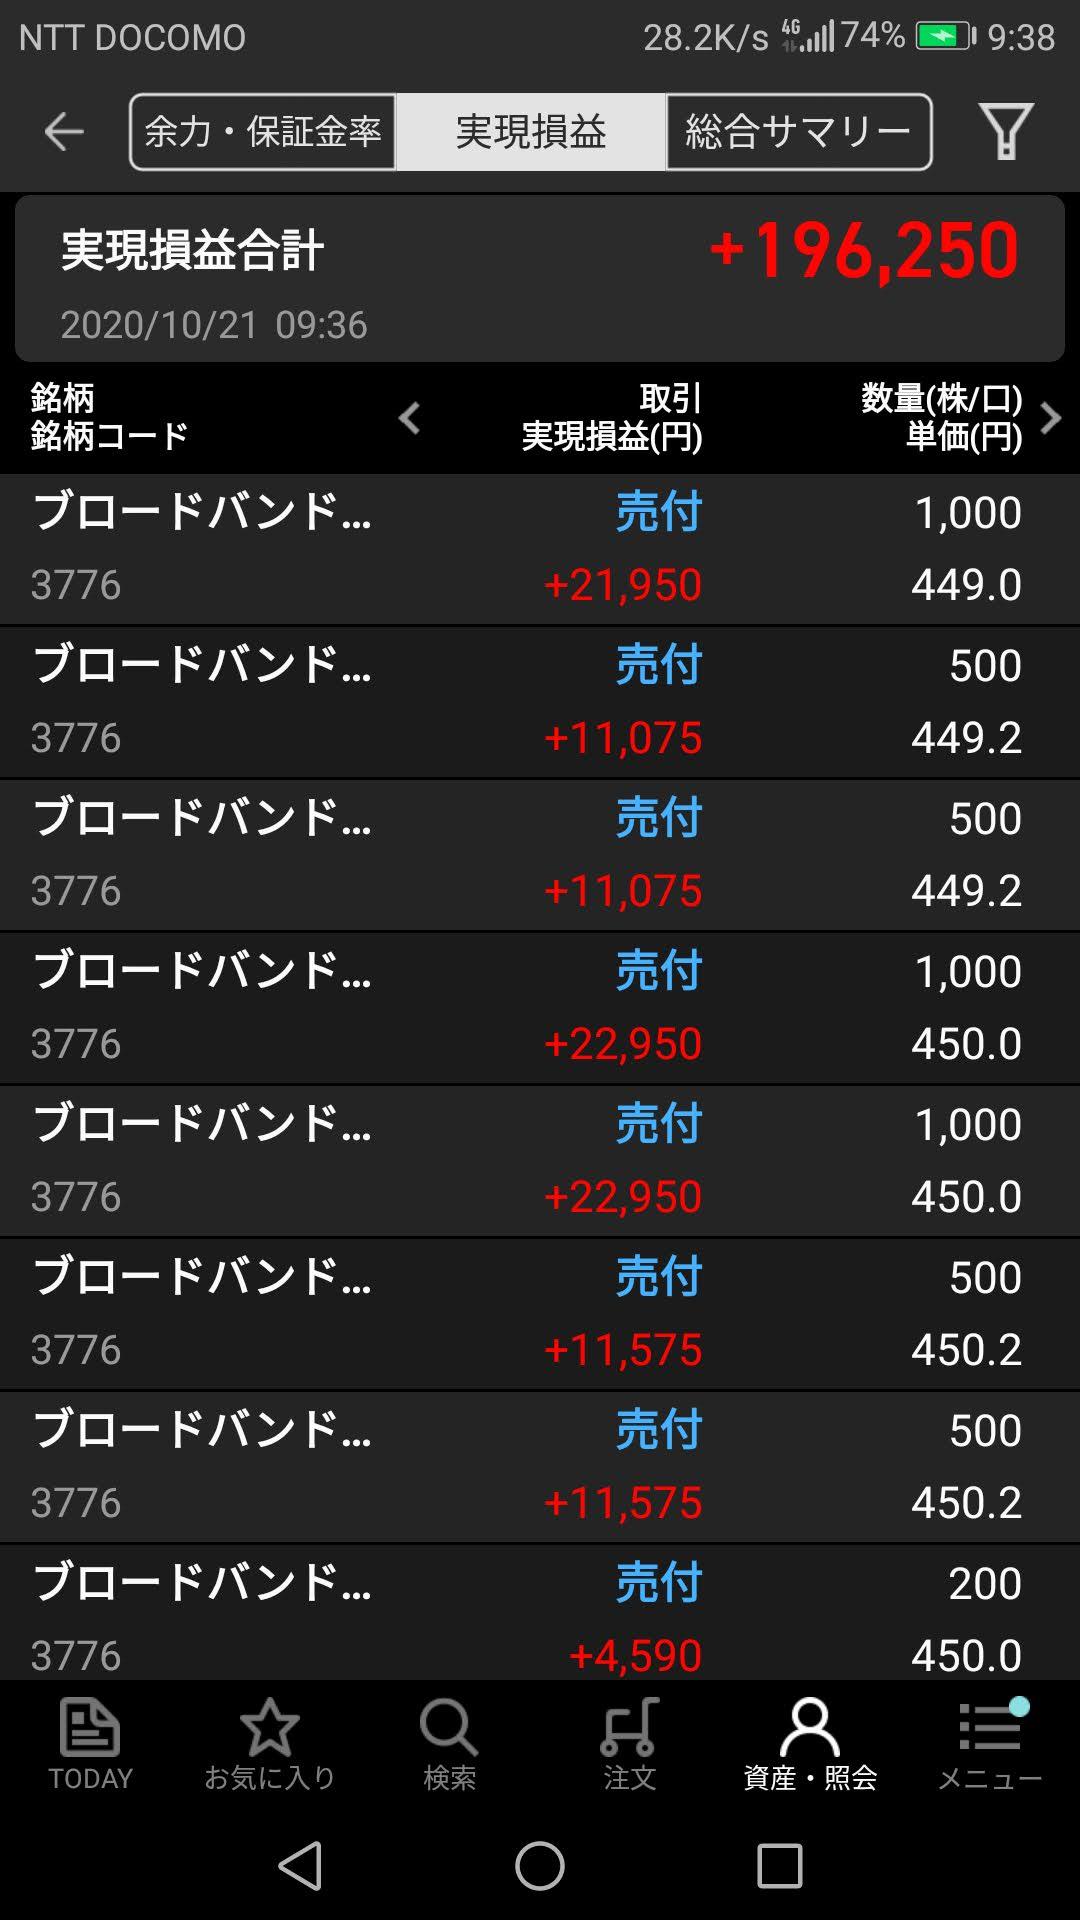 screenshot_20201021-093820